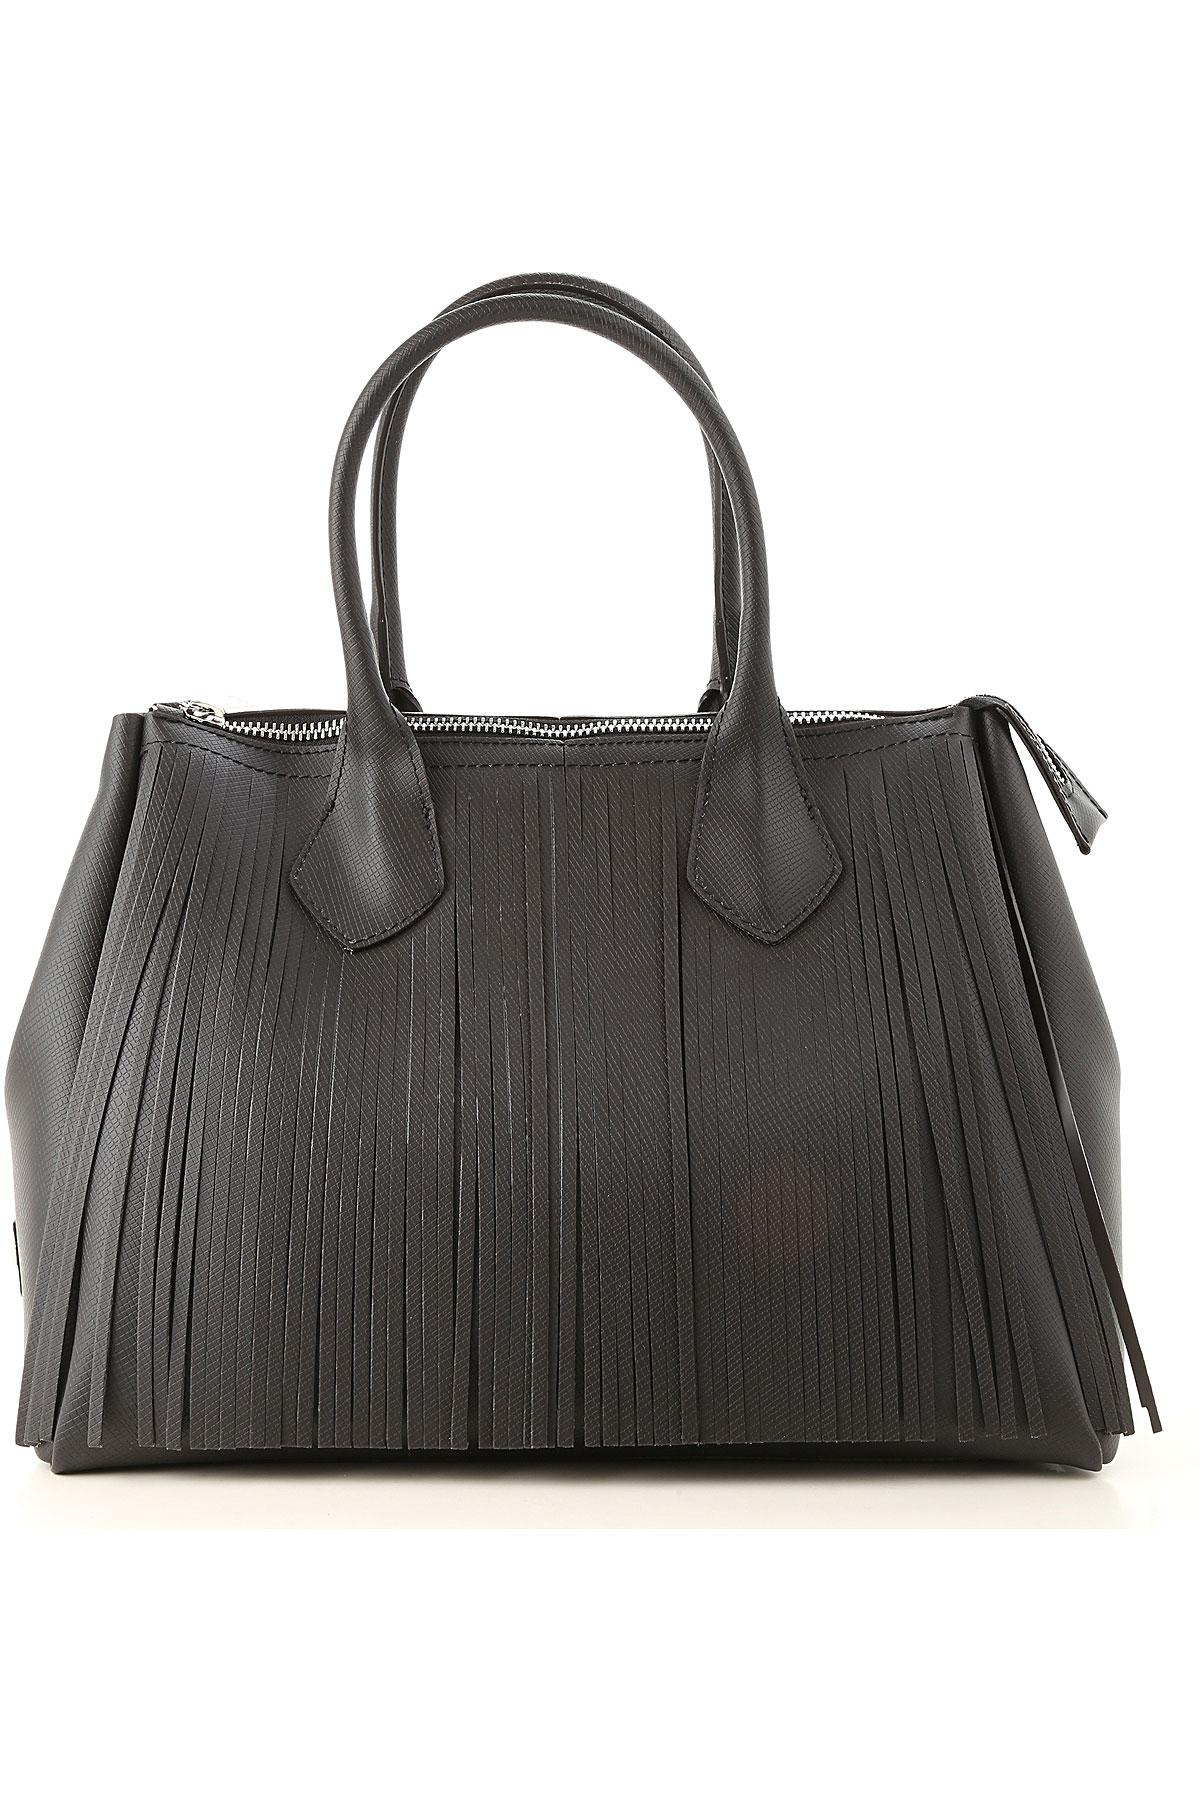 Image of GUM Gianni Chiarini Design Top Handle Handbag, Black, Coated Canvas, 2017